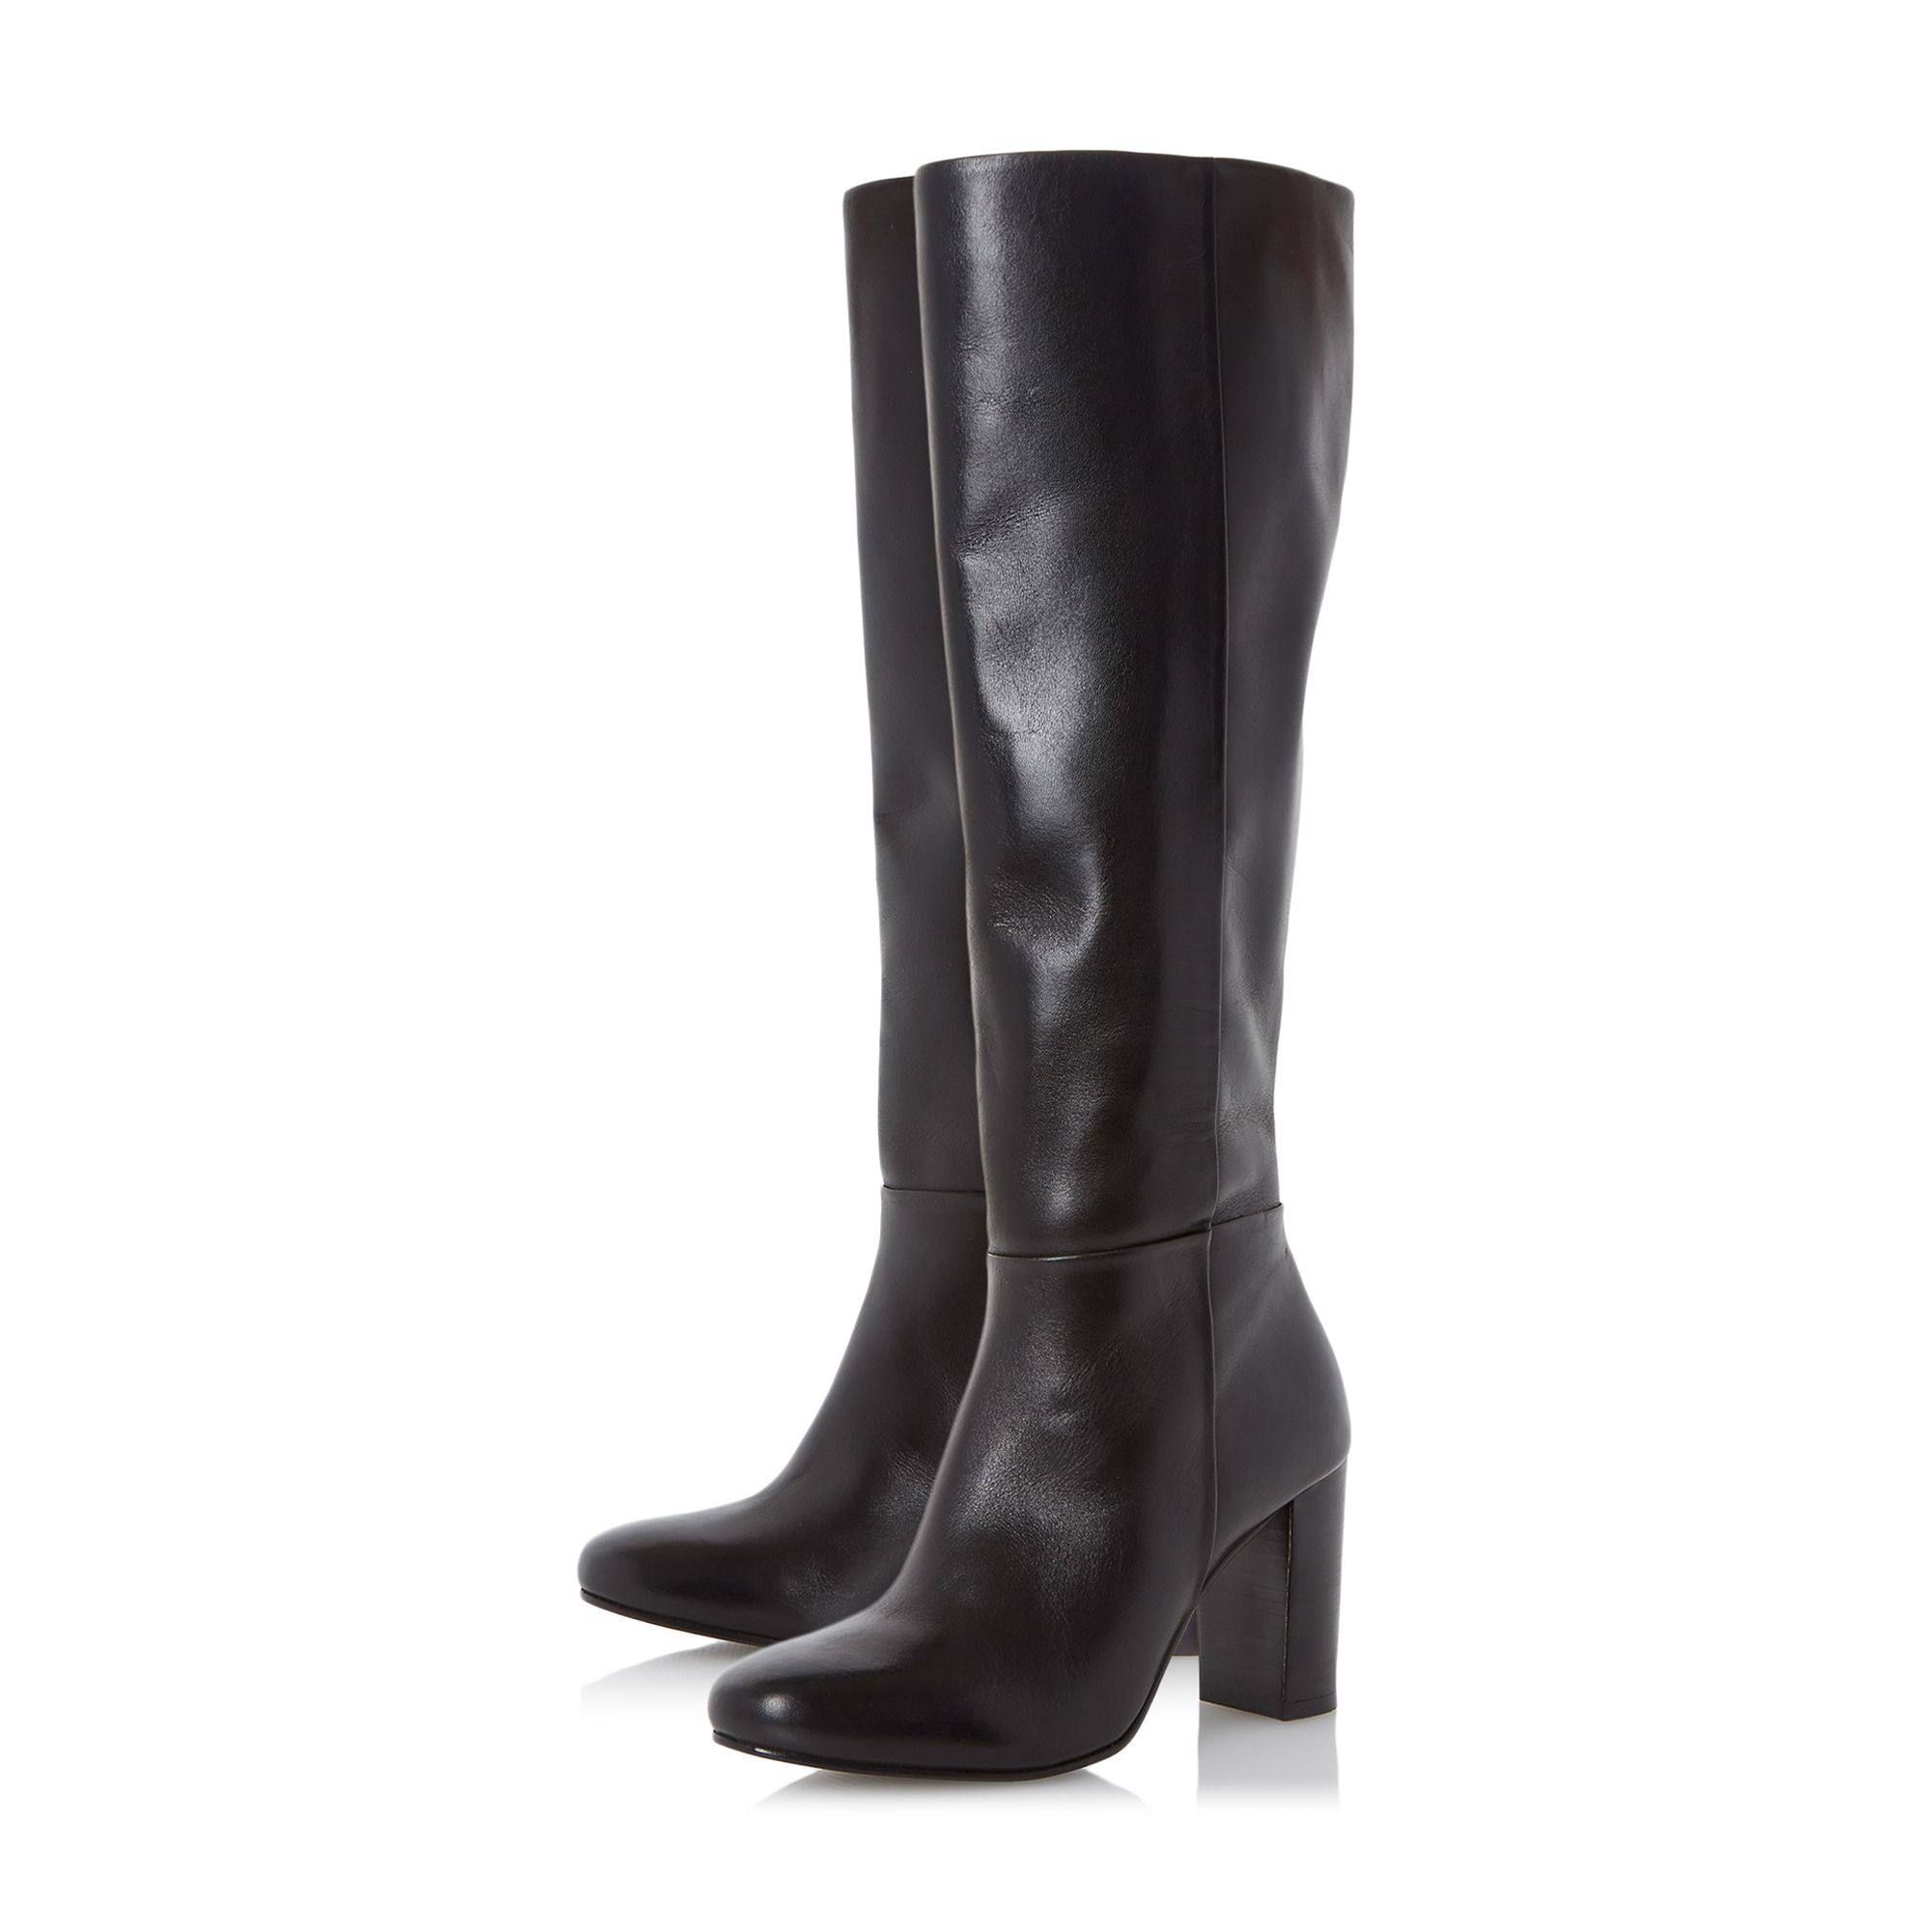 dune siena block heel leather knee high boots in brown lyst